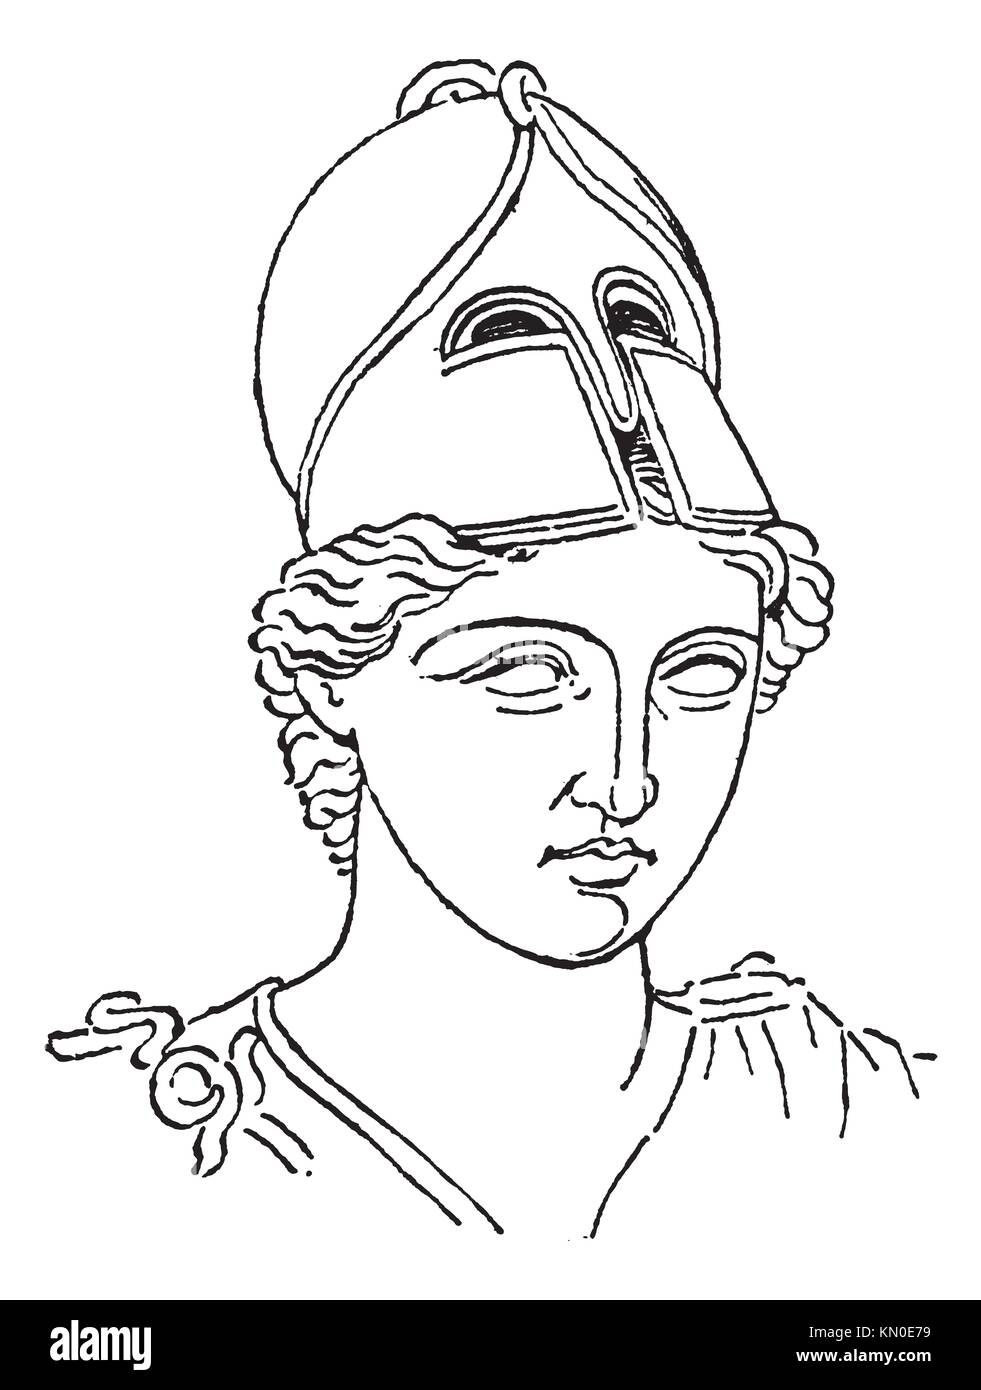 03985d8a1ad65 Cepillo de Centurión griego casco o galea vintage grabado grabado antiguo  ilustración del casco griego Imagen